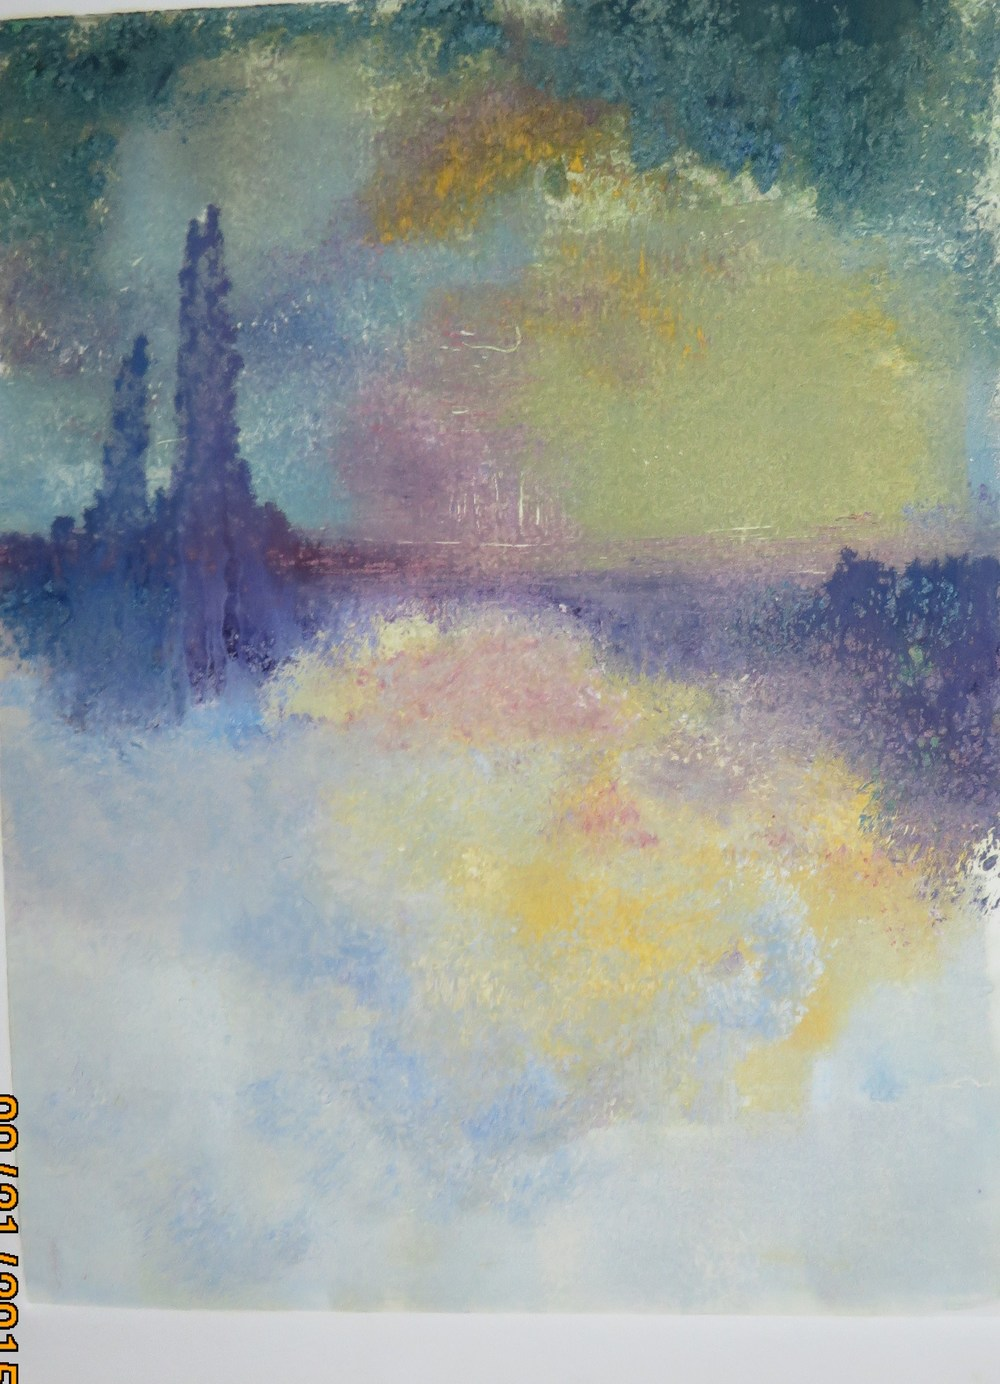 """Trestle Bridge - Foggy Night""  - Monoprint"